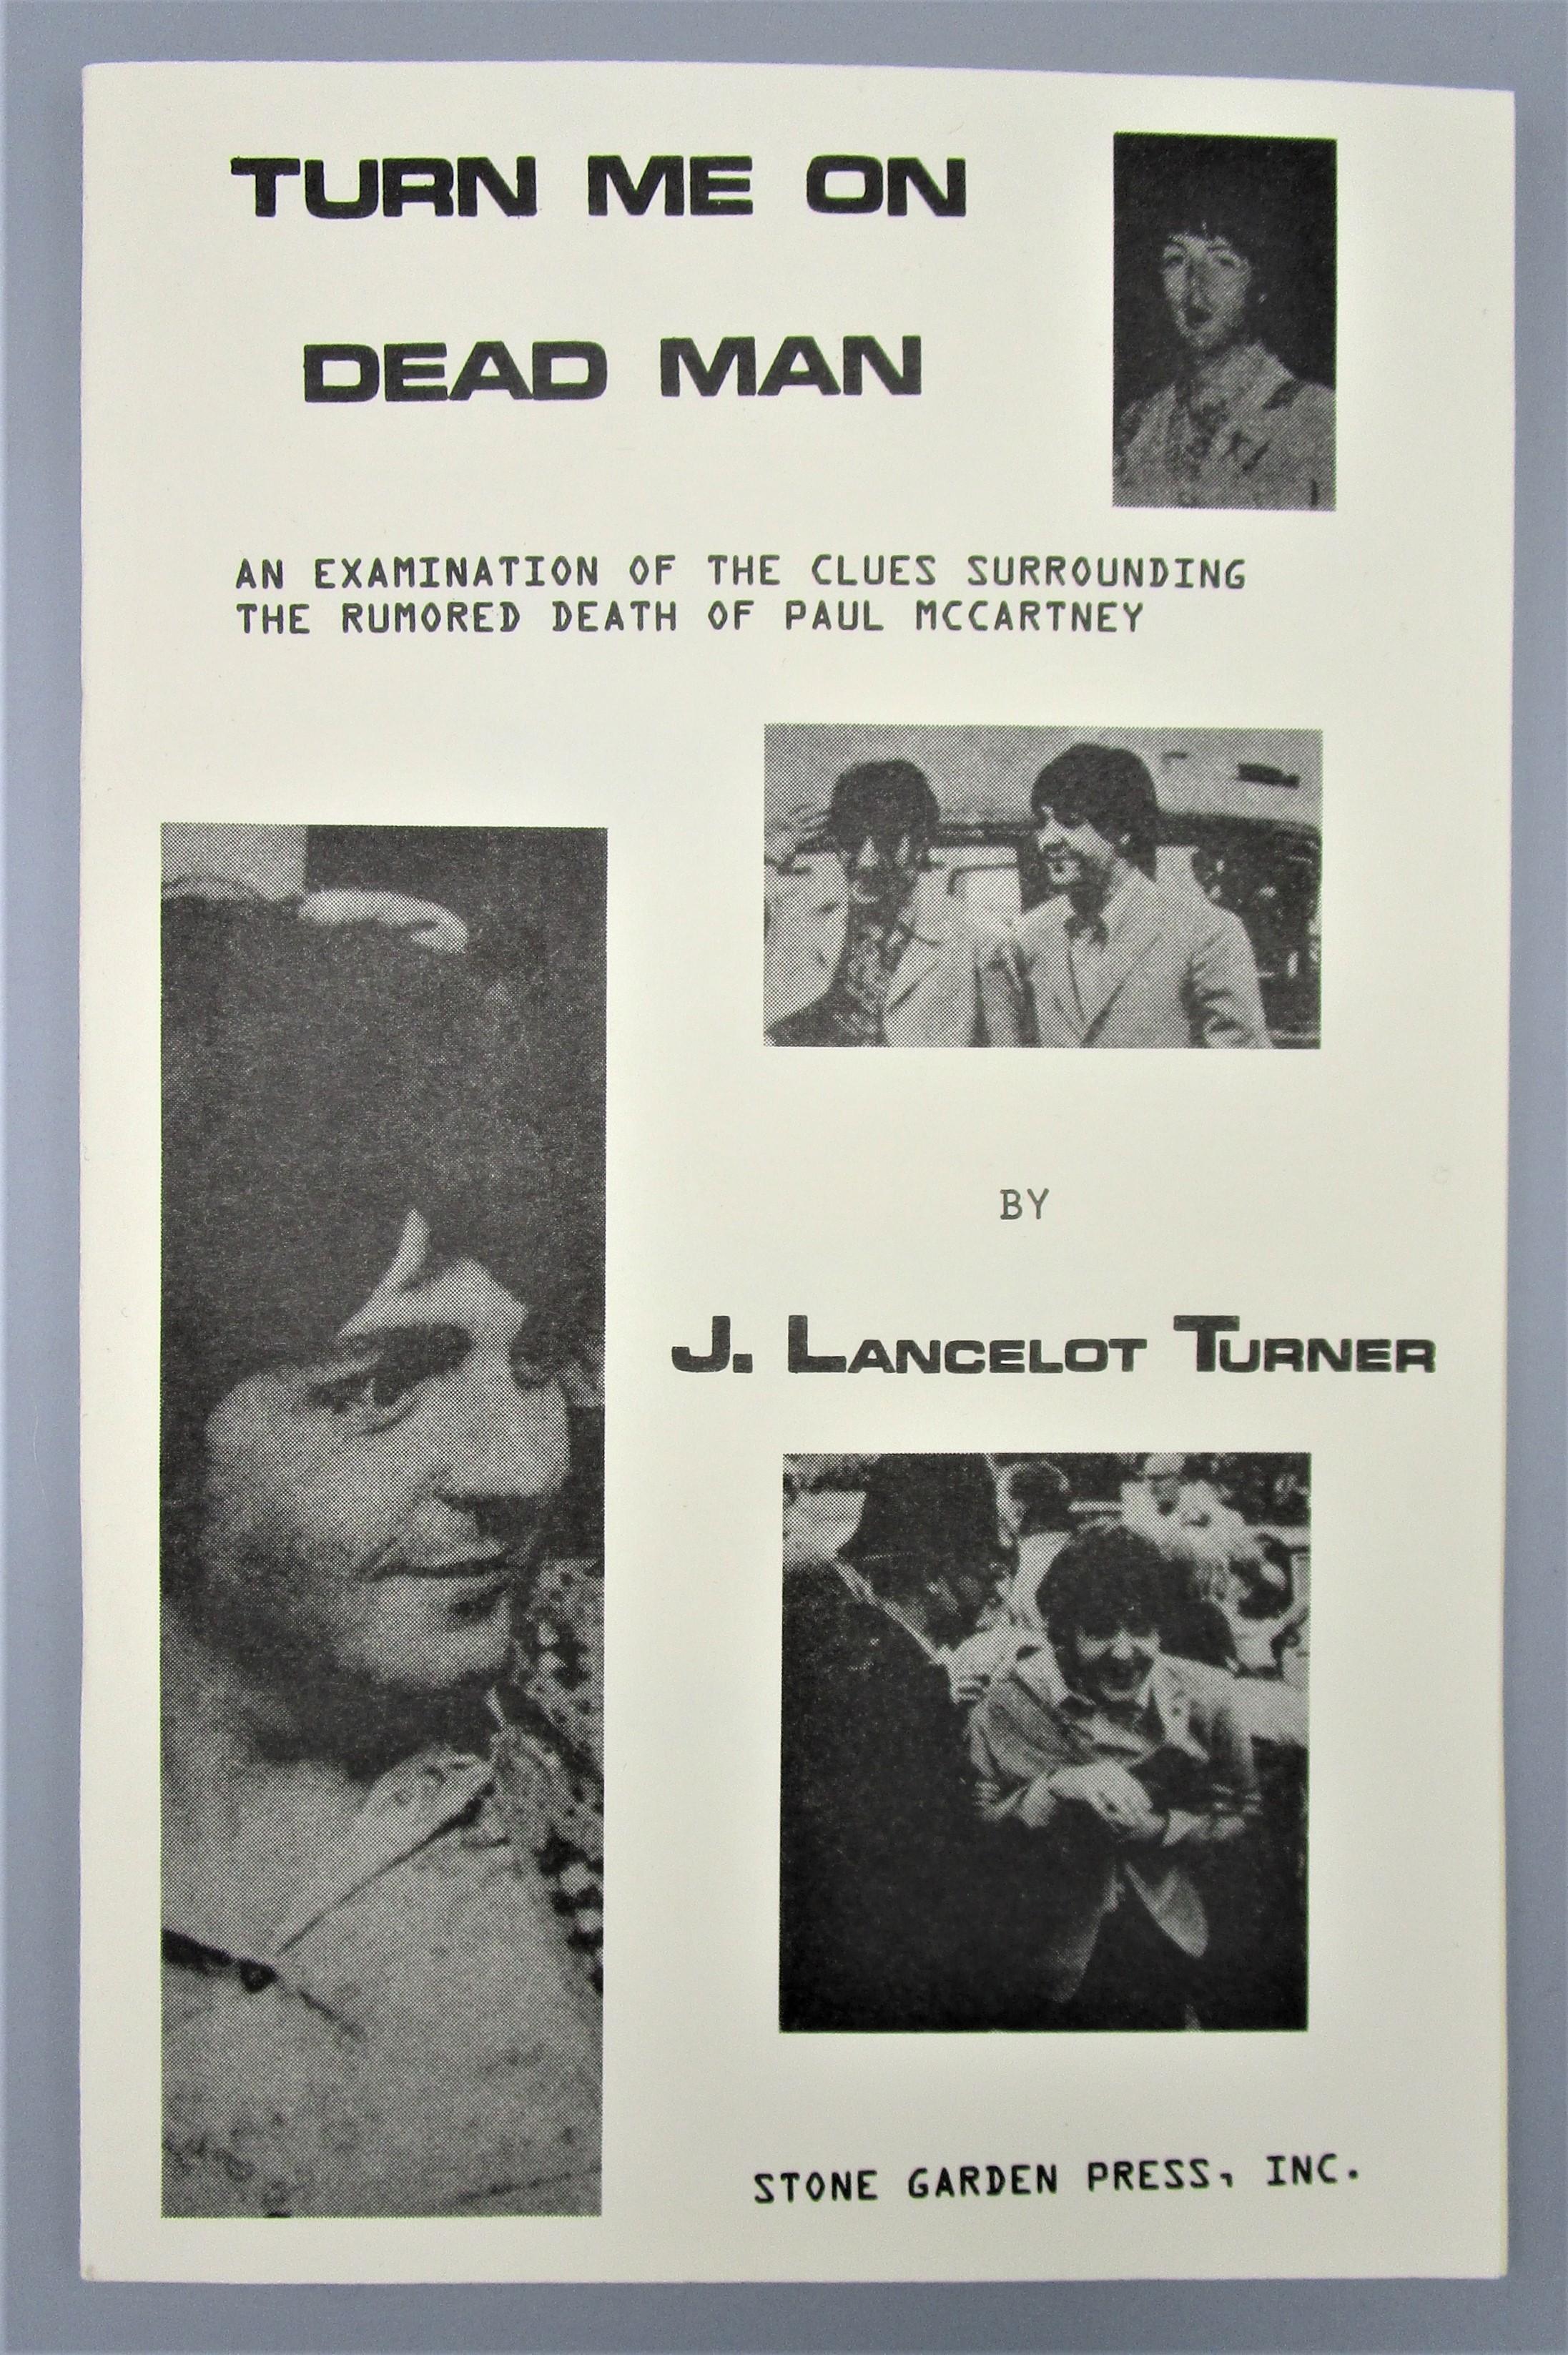 TURN ME ON DEAD MAN, by J. Lancelot Turner - 1969 [1st Ed]